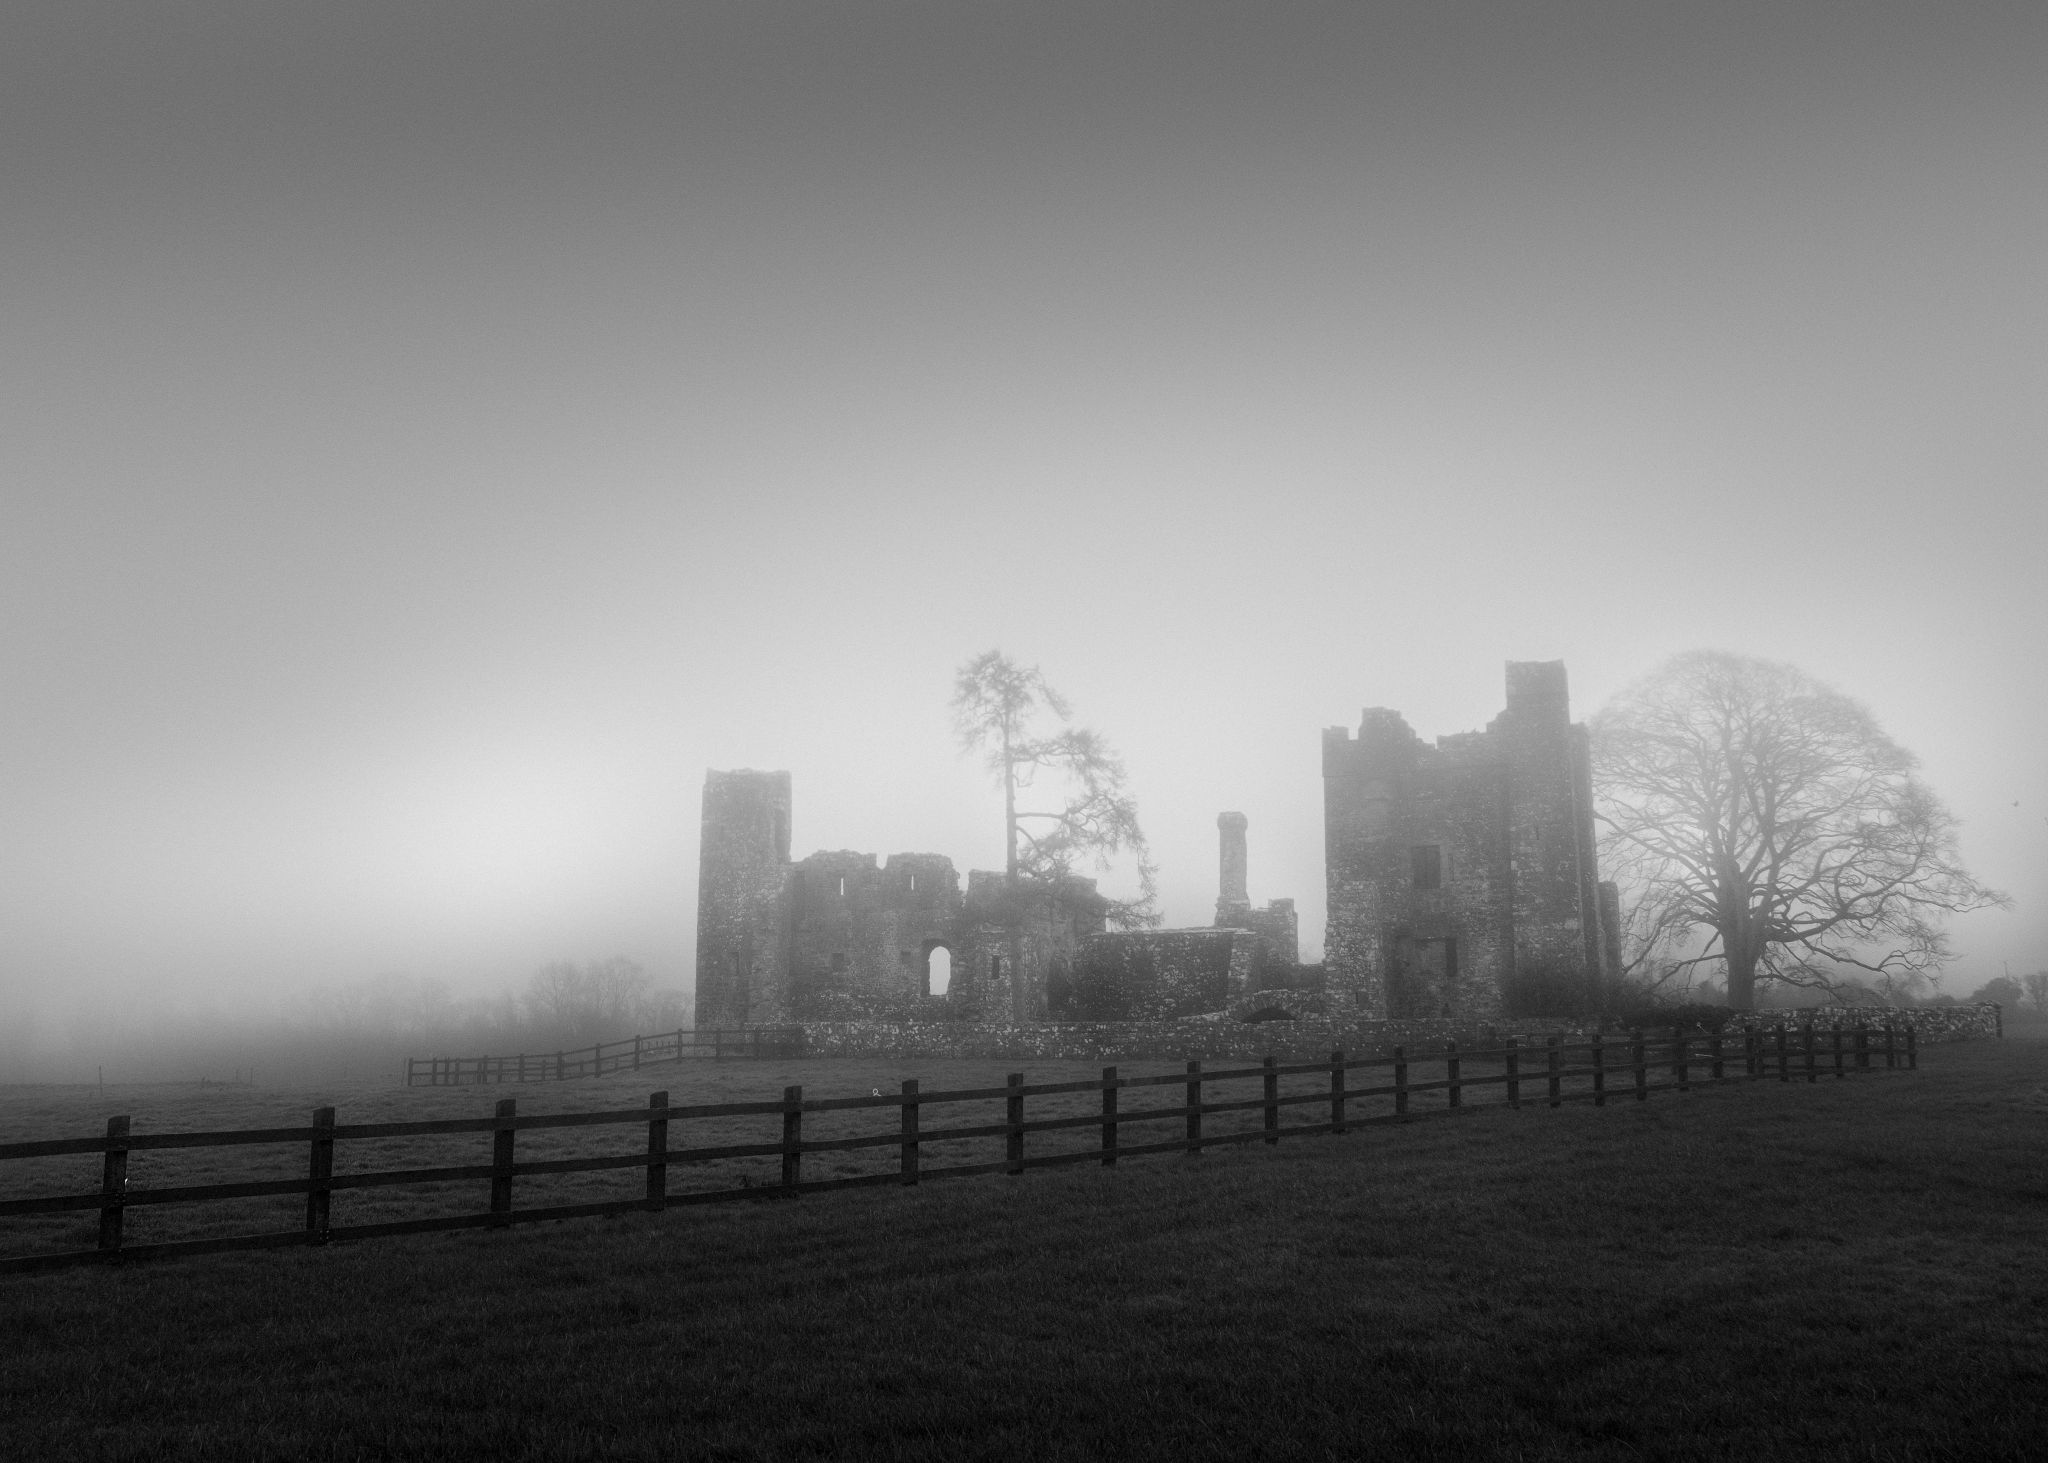 Bective Abbey, Ireland